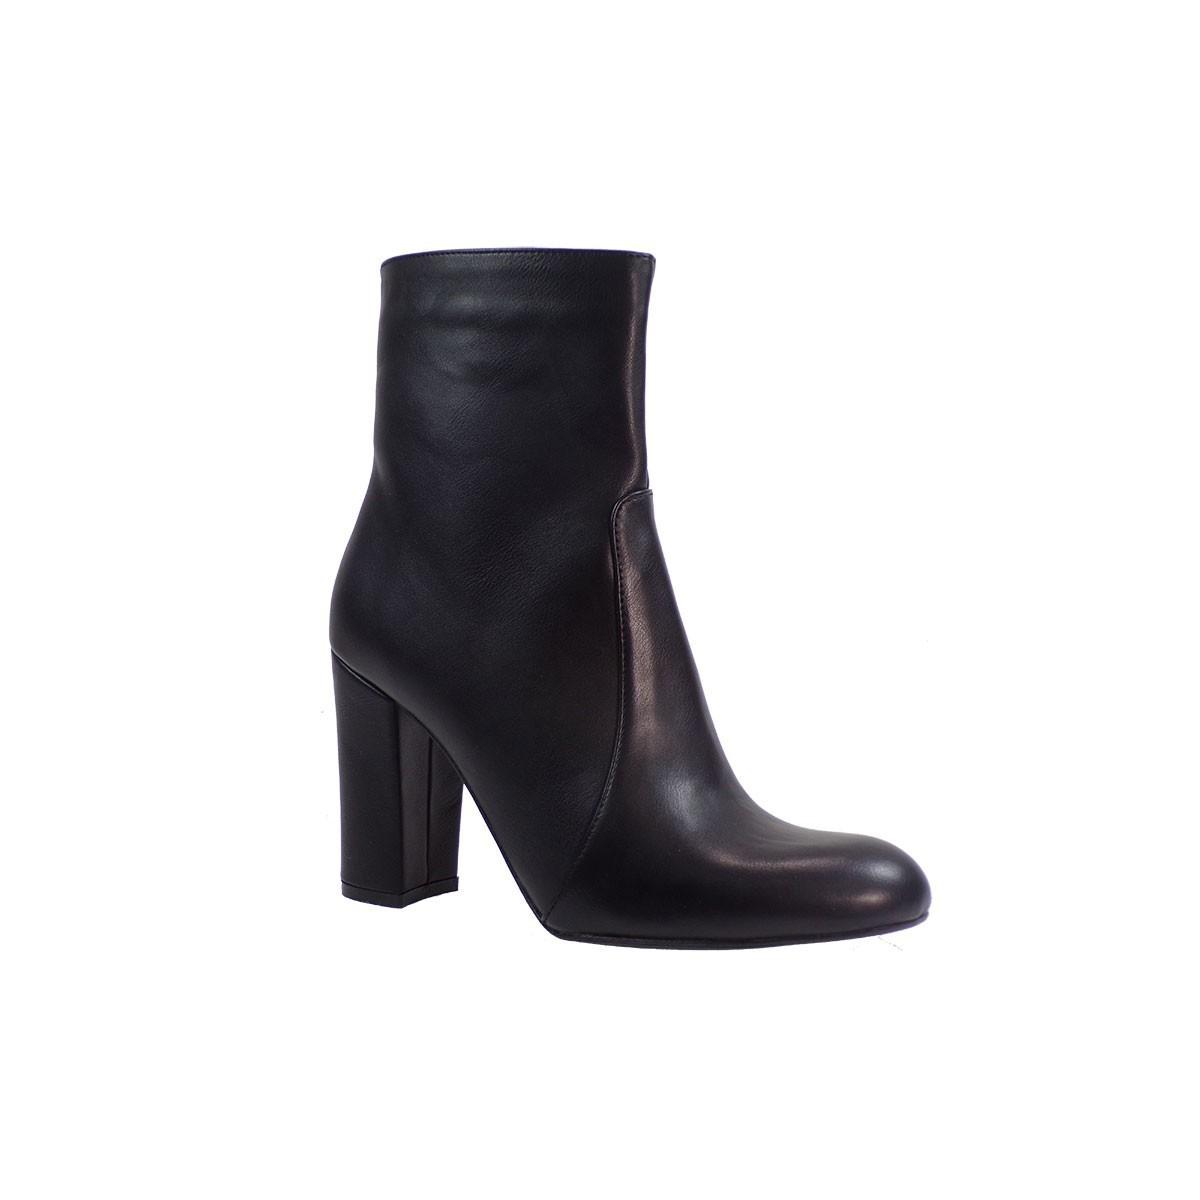 Fashion Icon Γυναικεία Παπούτσια Μποτάκια f09-06635 Μαύρο